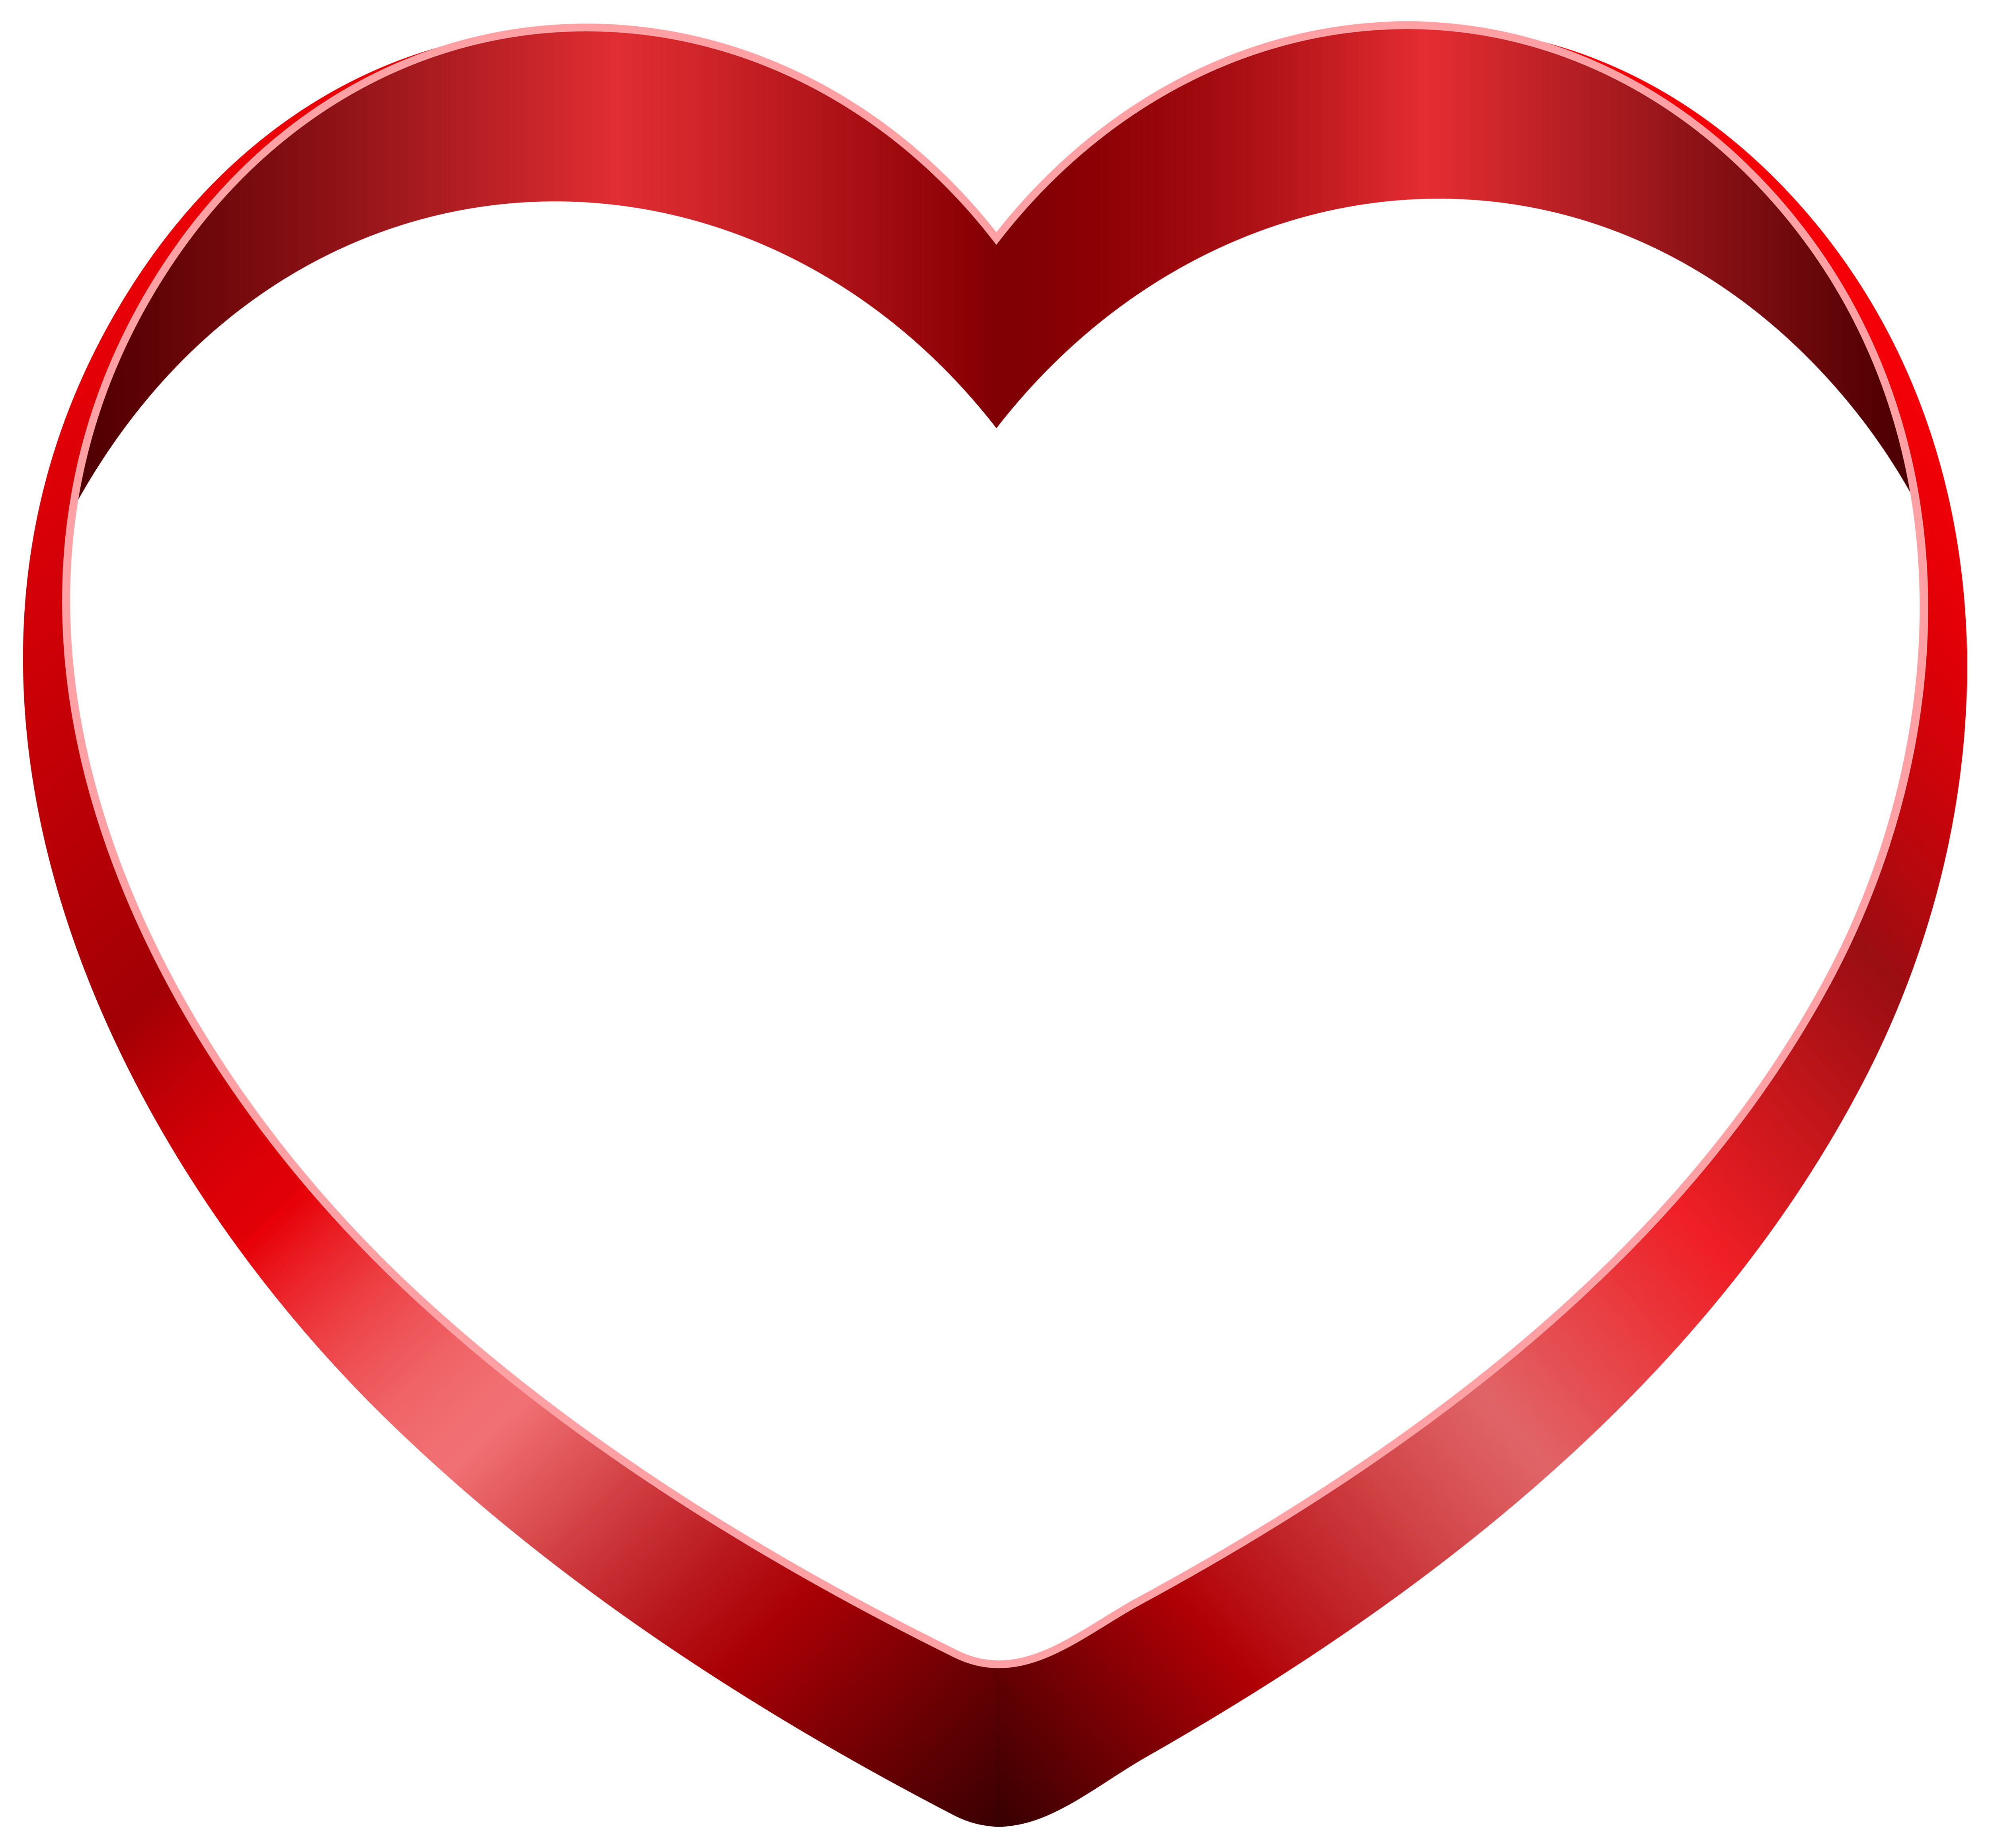 Transparent Heart PNG Clipart.